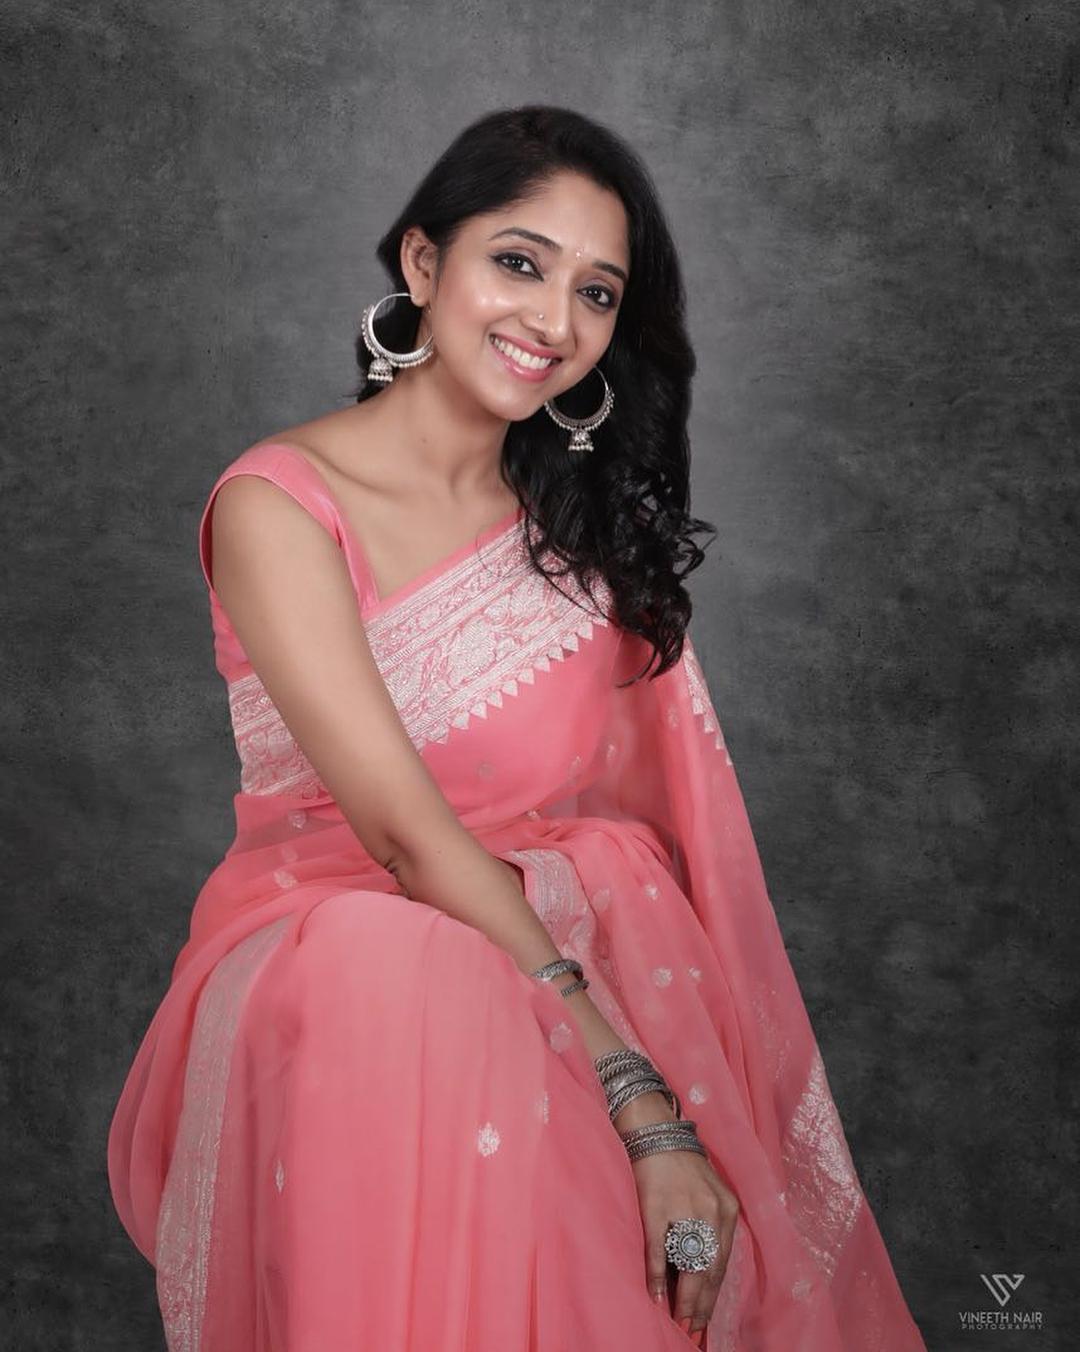 Beautiful Indian girls Photos in saree | All Indian Models